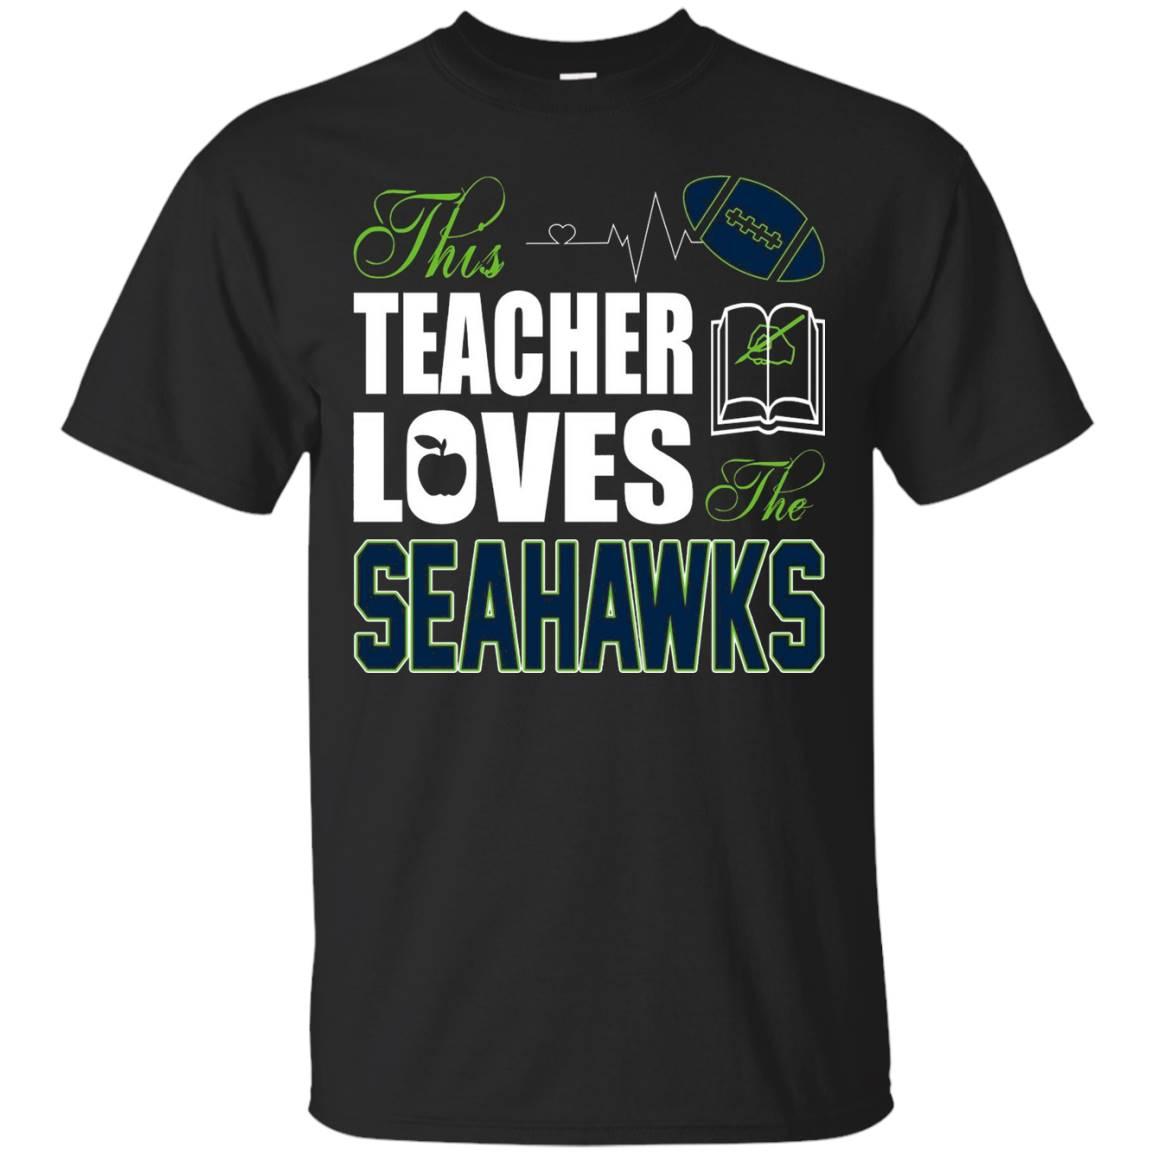 Apparel Sports Gear Football Tshirt Teacher Loves Seahawks – T-Shirt